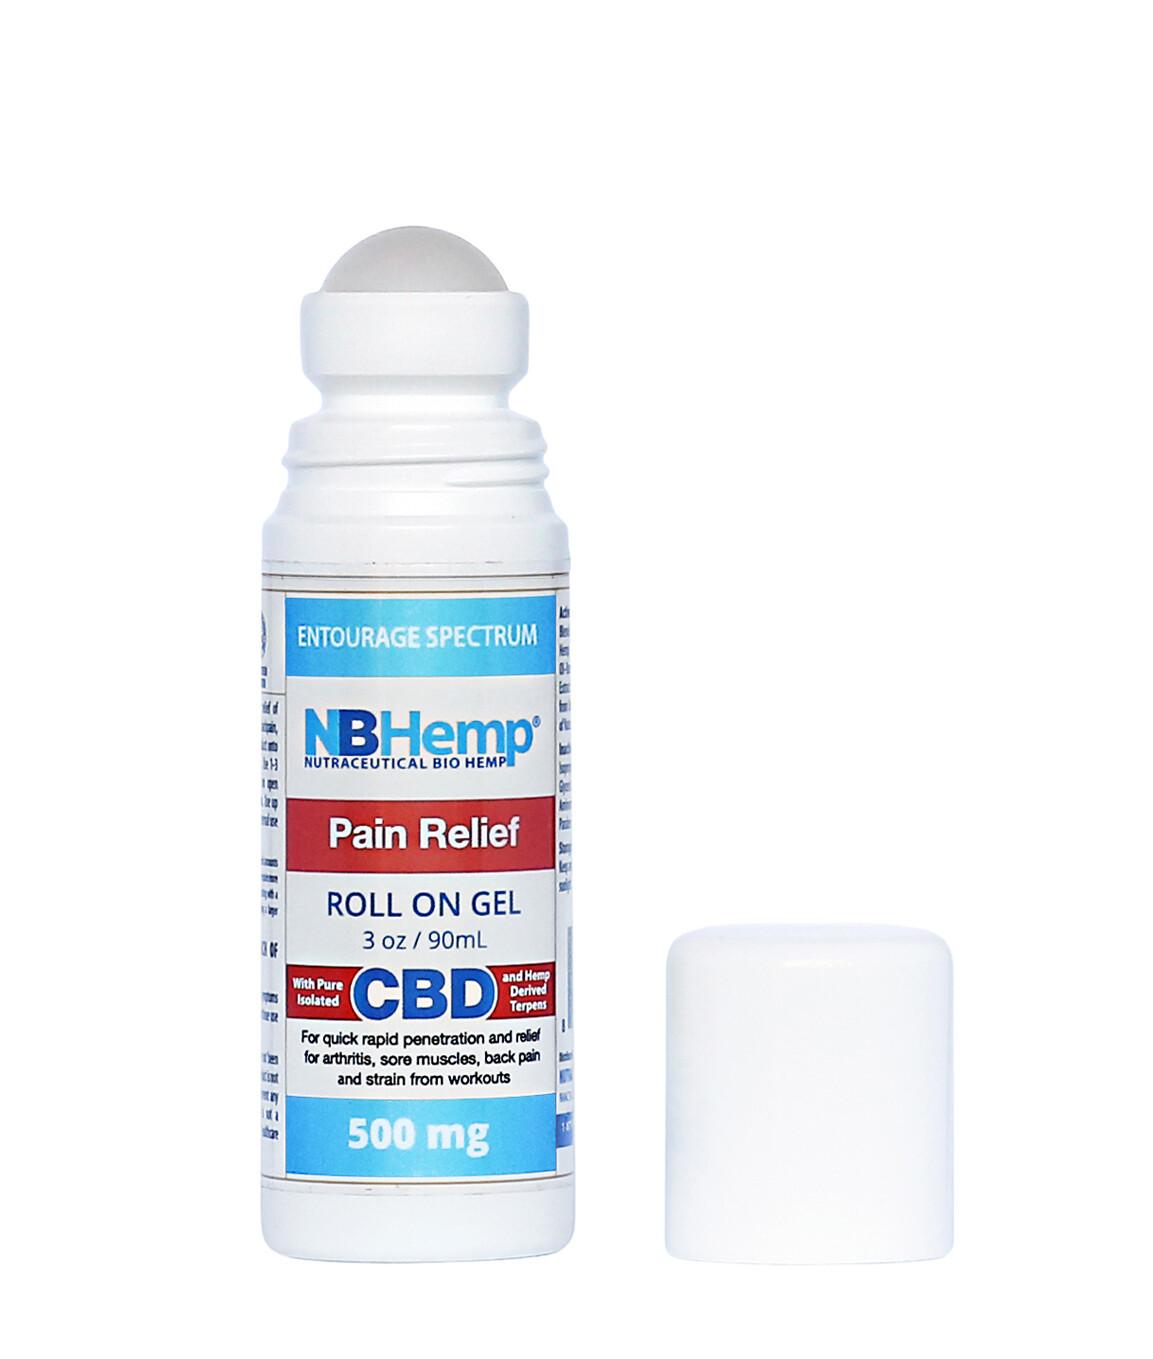 Pain Relief CBD Roll On Gel (1500 Mg), 3 Oz (90ml),